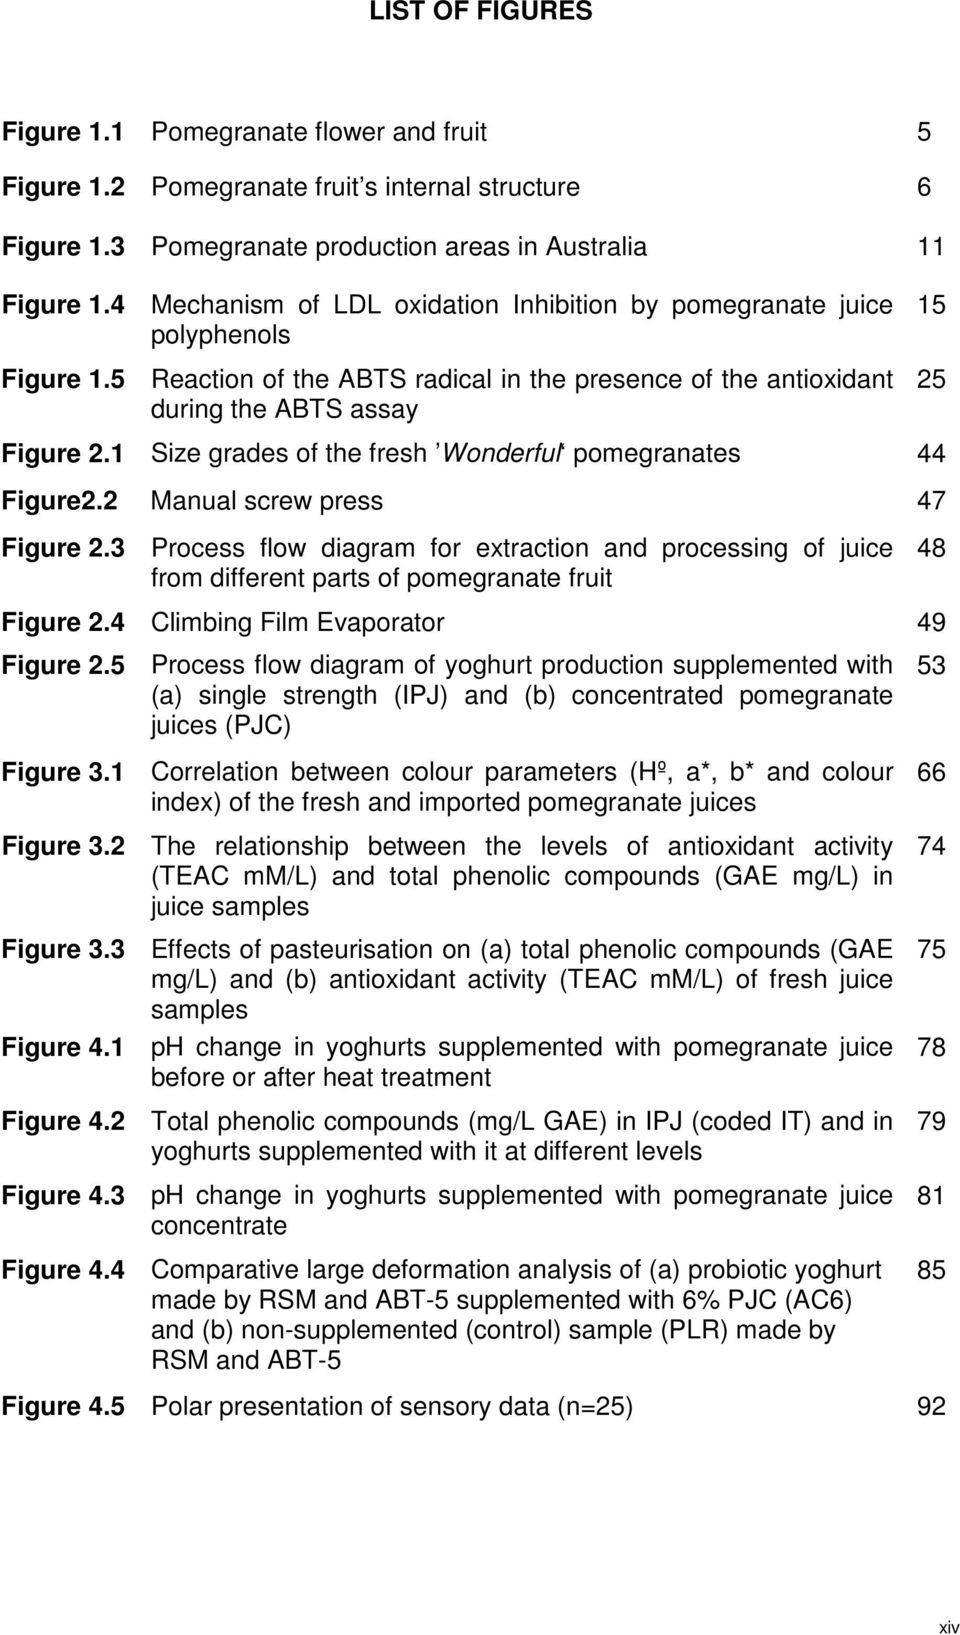 hight resolution of 1 size grades of the fresh wonderful pomegranates 44 figure2 2 manual screw press 47